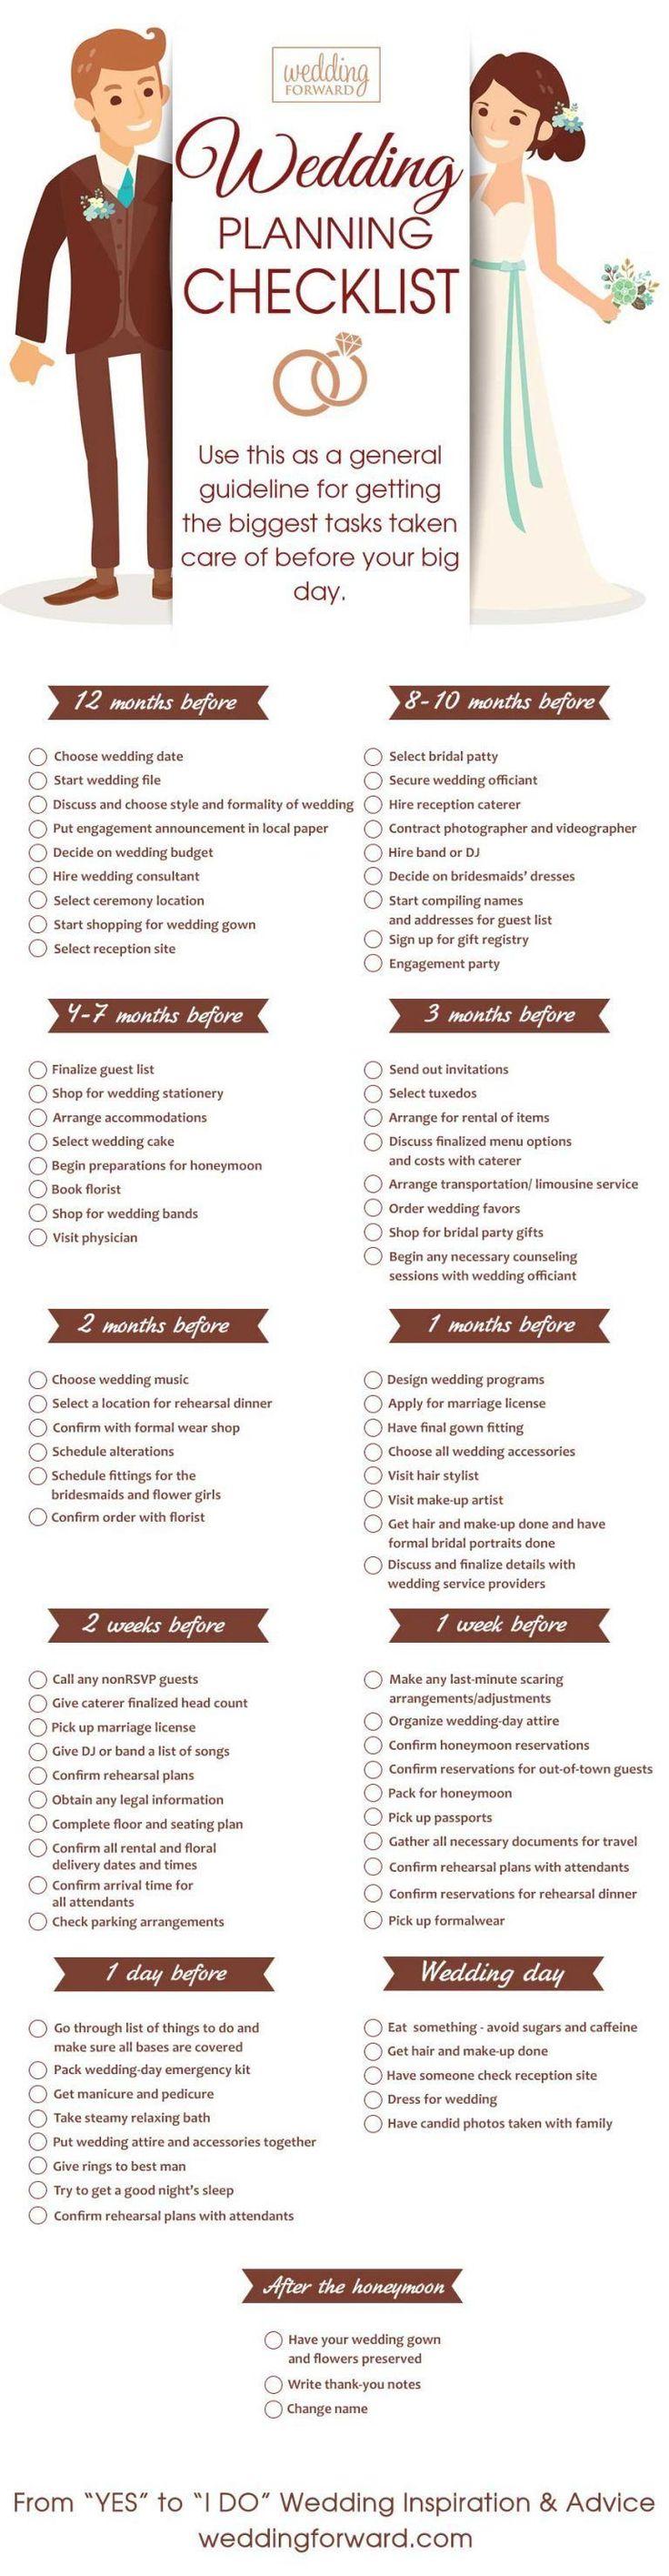 12 Month Wedding Planning Timeline #weddingplanningtimeline #weddingplanningchecklist